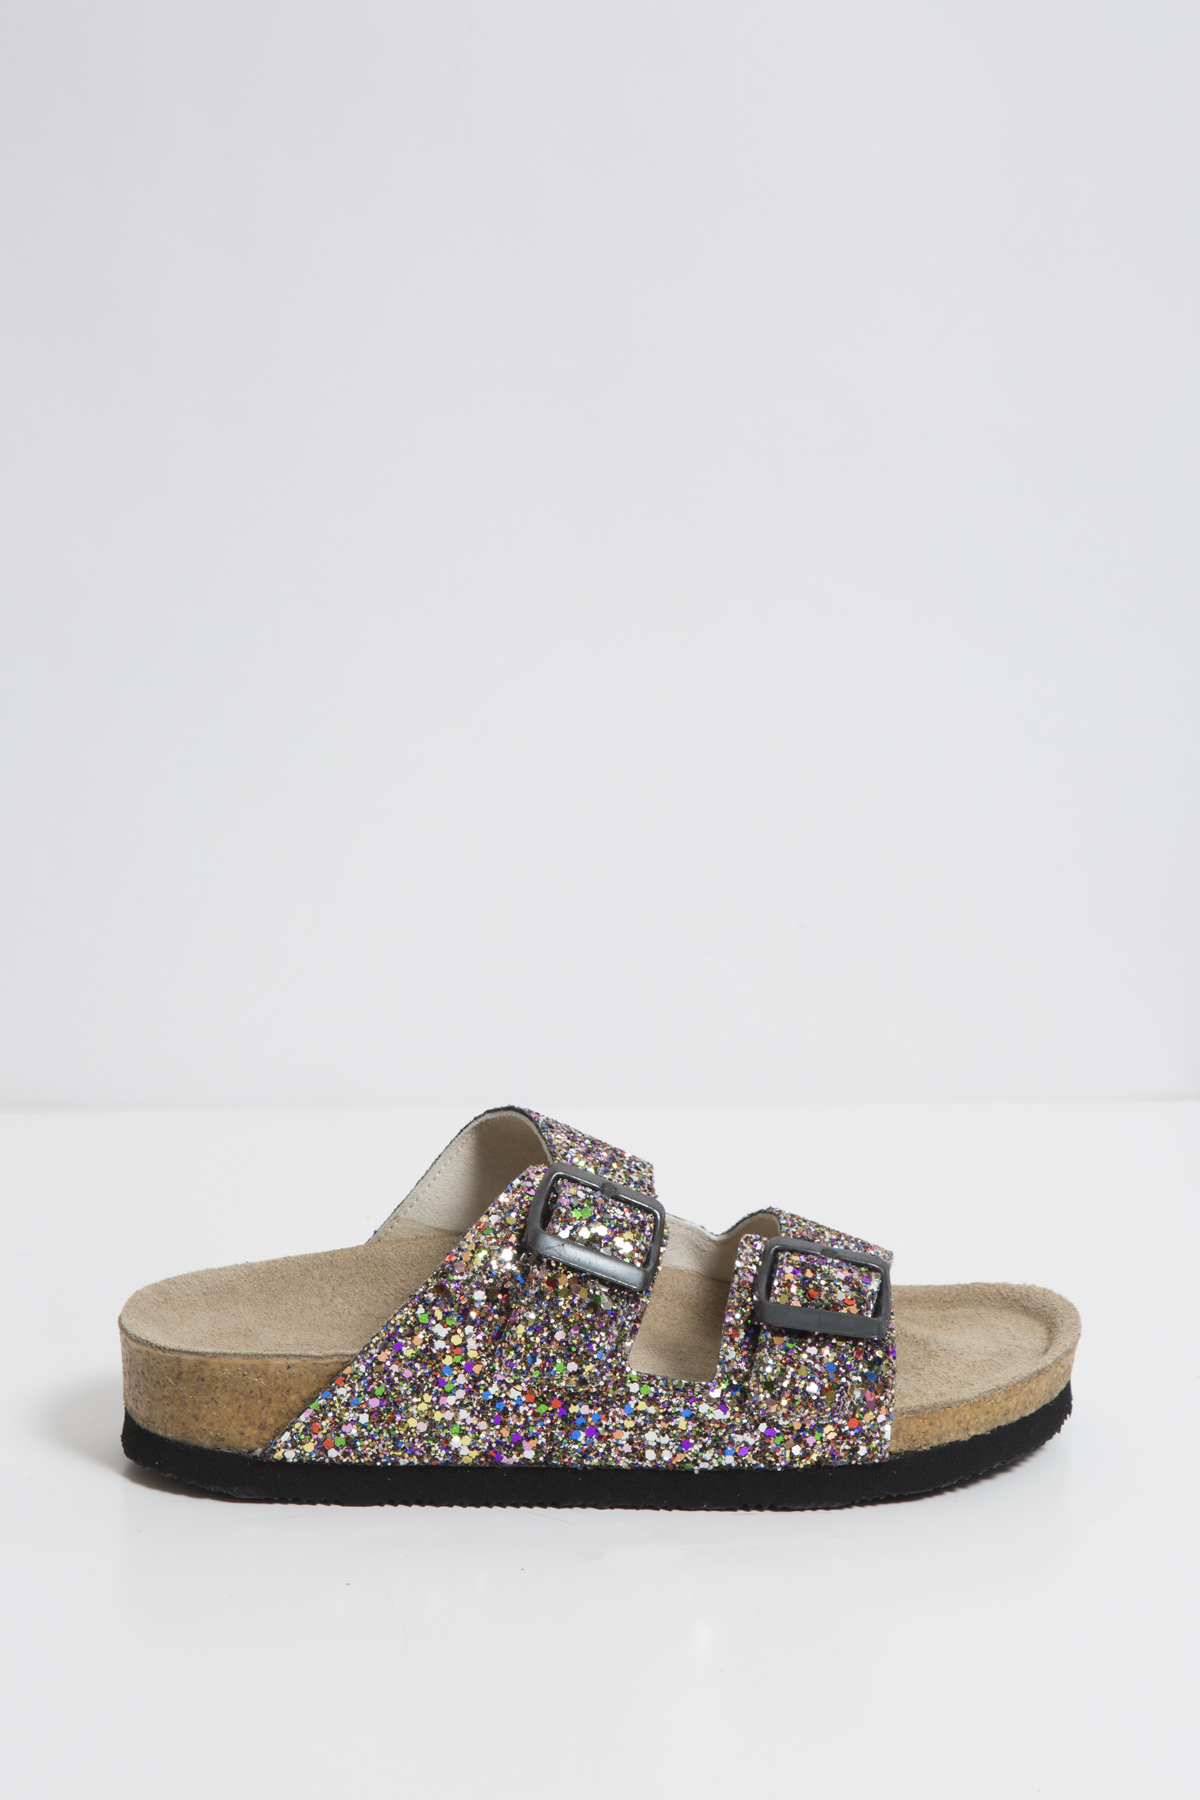 0043-LAMG-navy-edera-malibu-sandals-glitter-anniel-matchboxathens